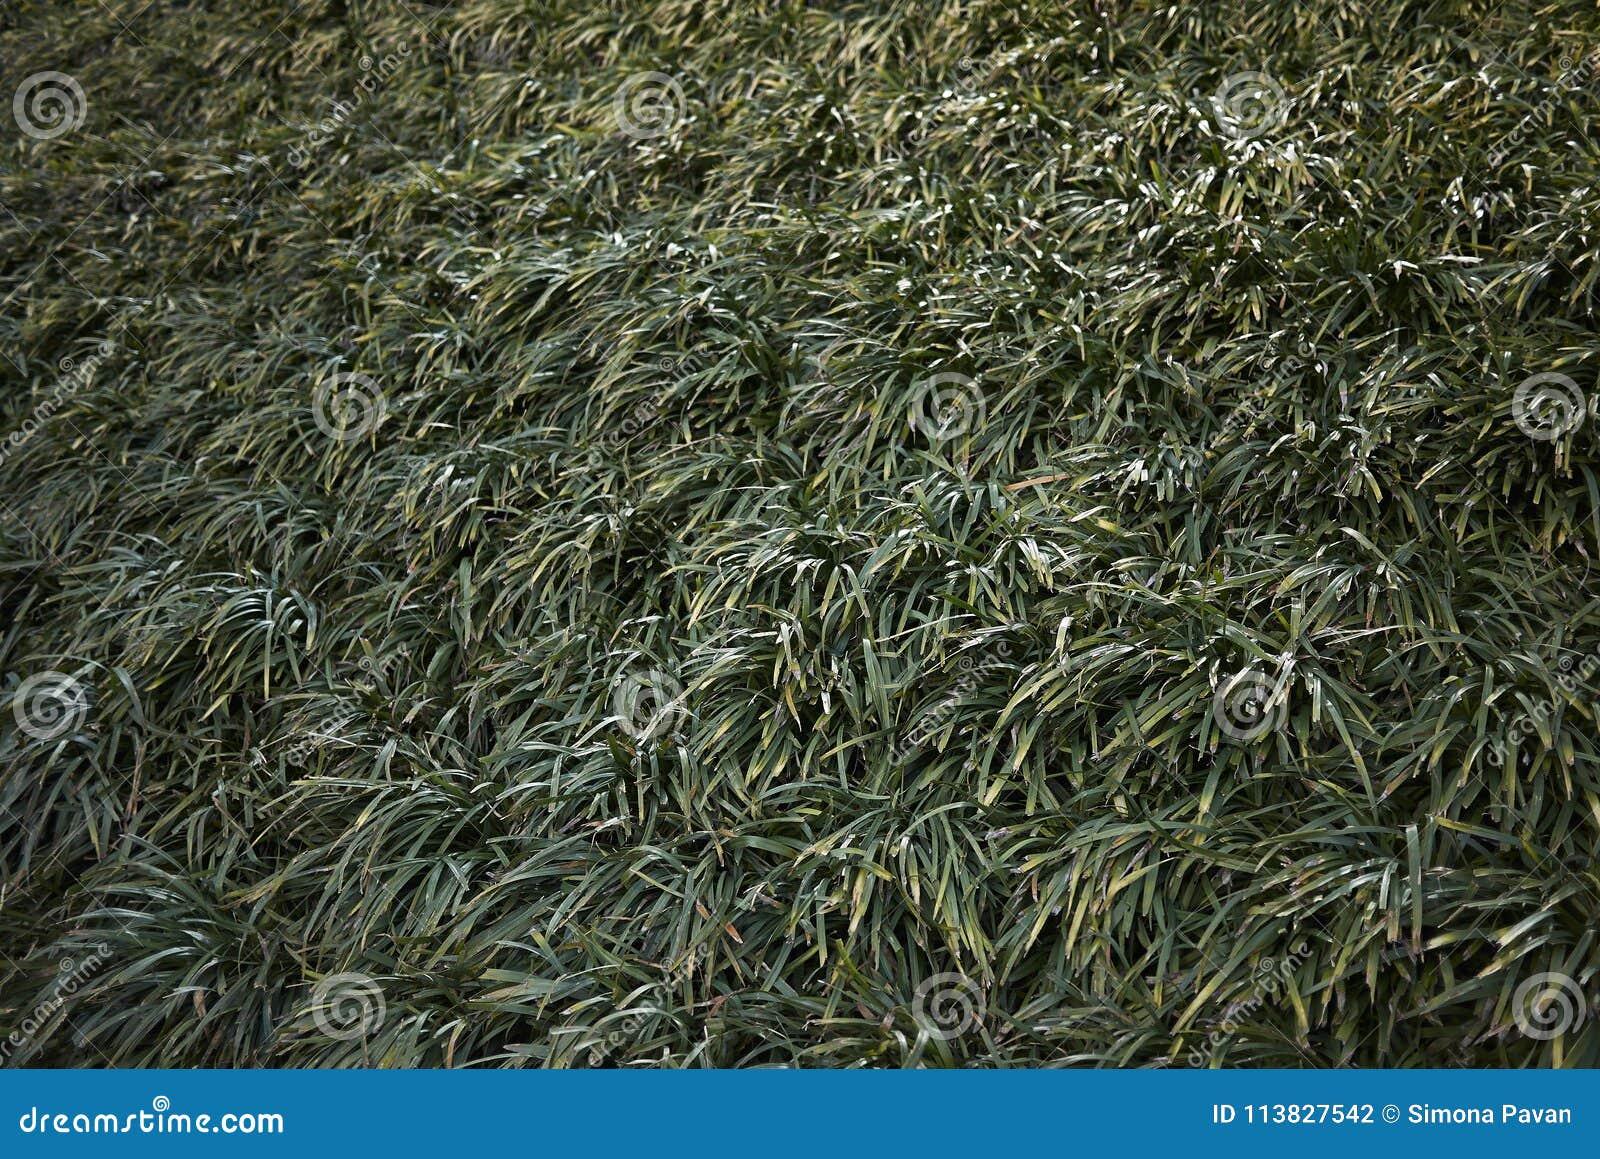 Liriope Muscari Plants Stock Photo Image Of Lush Garden 113827542